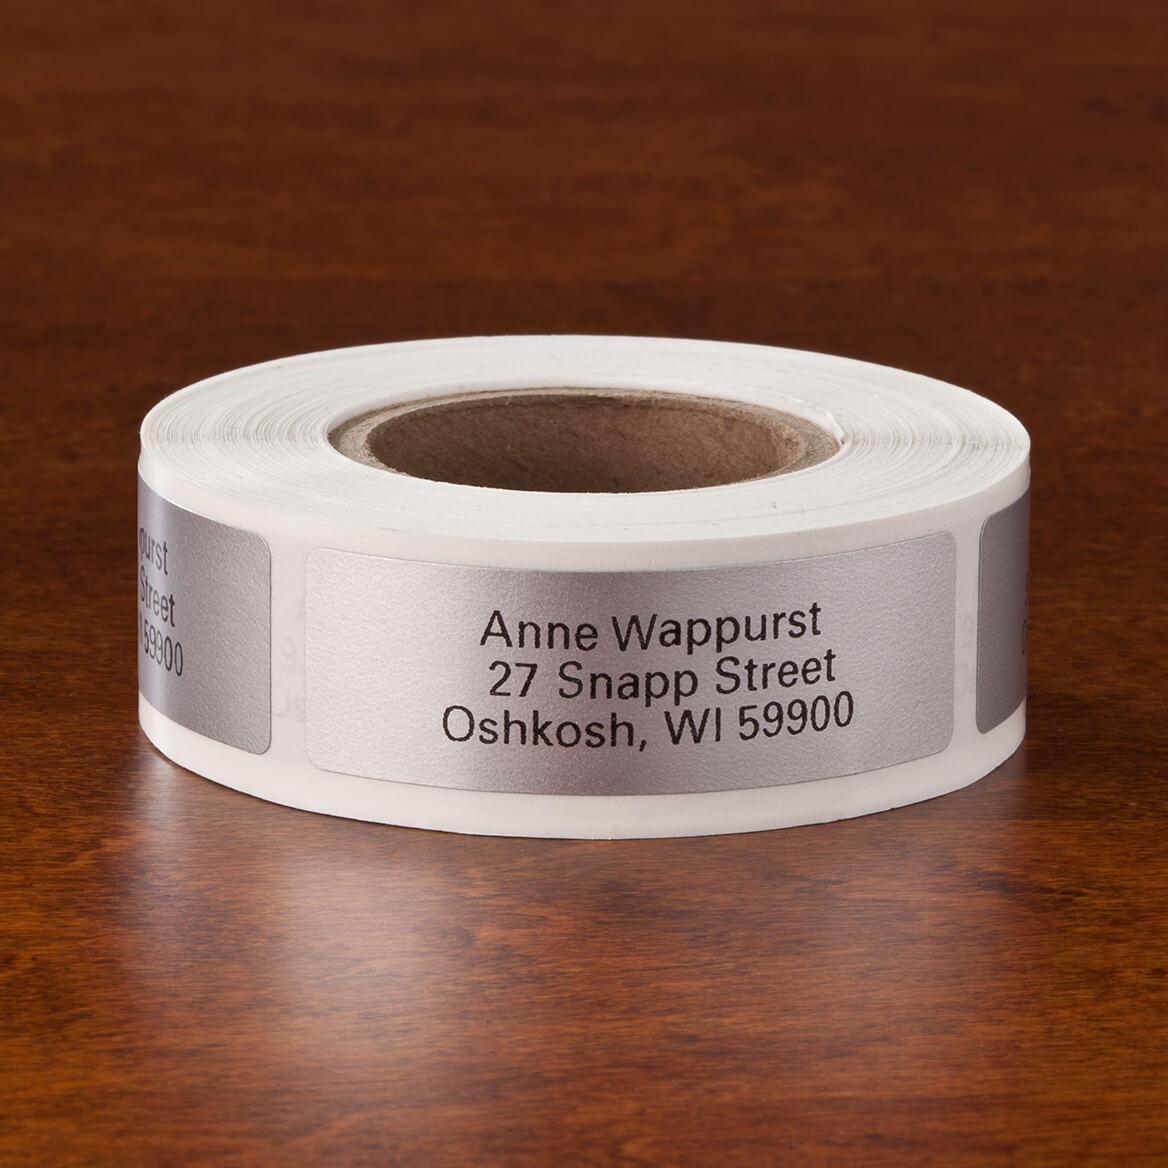 Personalized Self-Stick Address Labels - Set of 200-357456